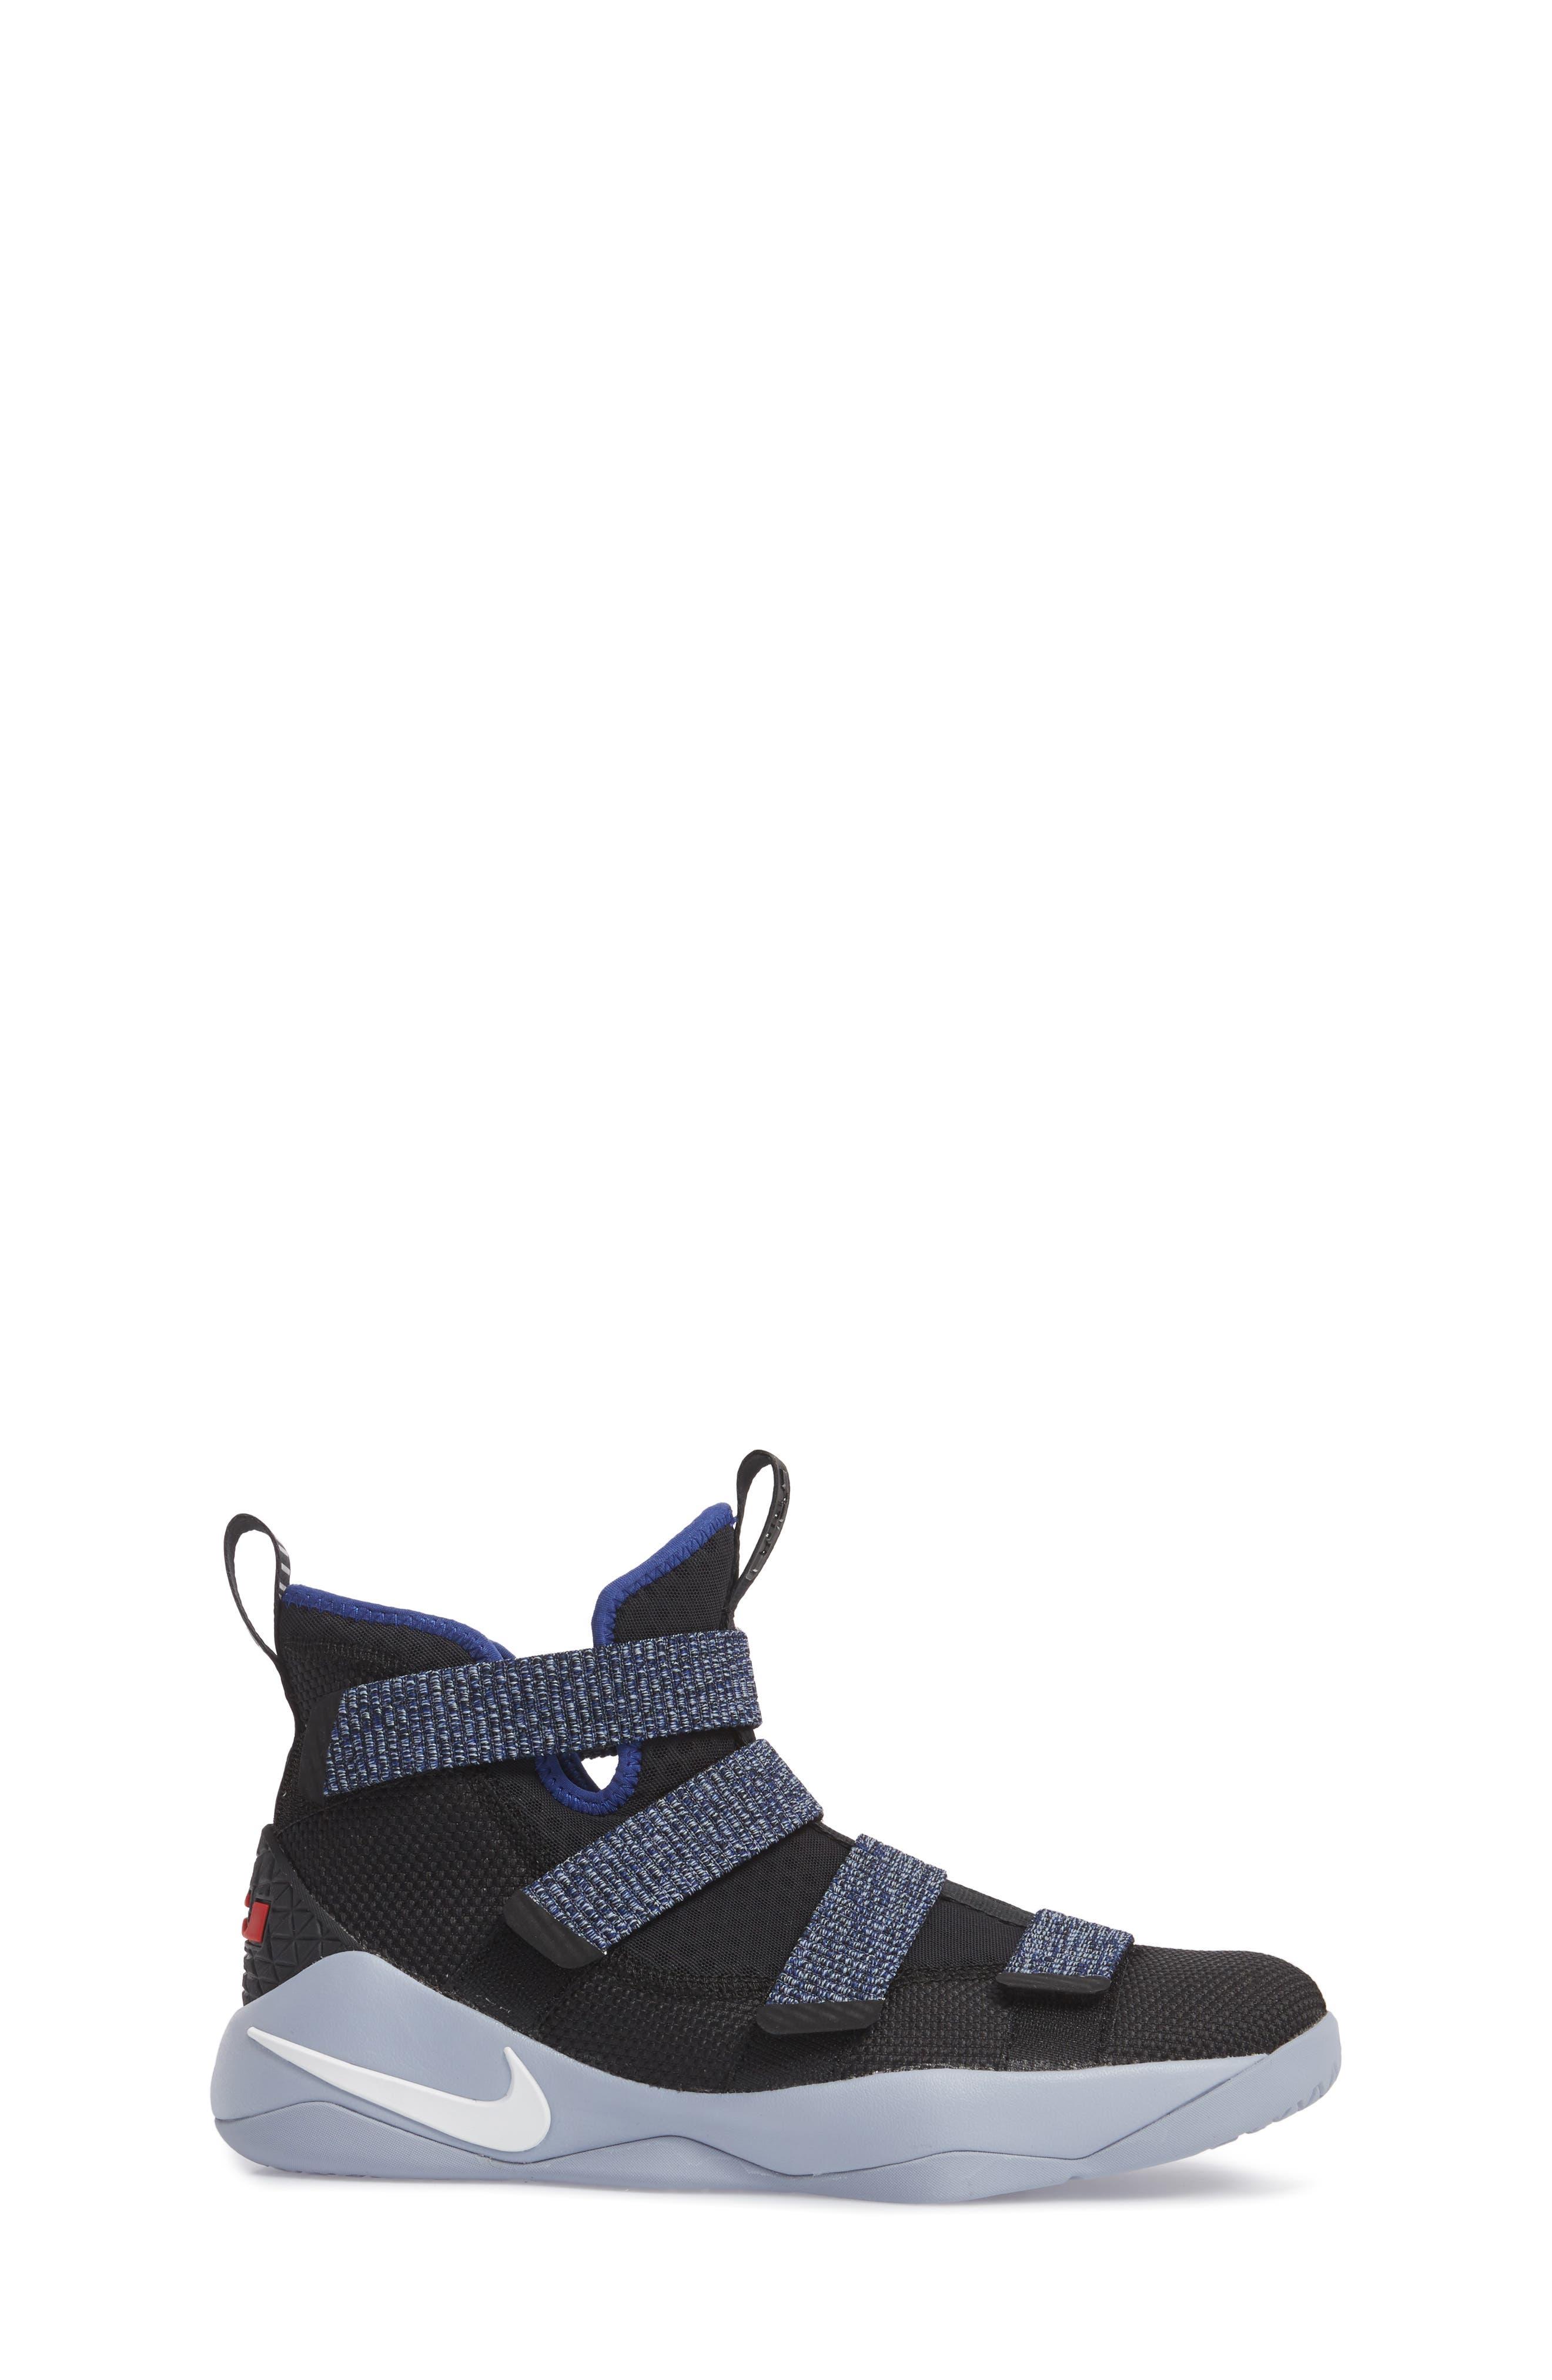 LeBron Soldier XI Basketball Shoe,                             Alternate thumbnail 3, color,                             005